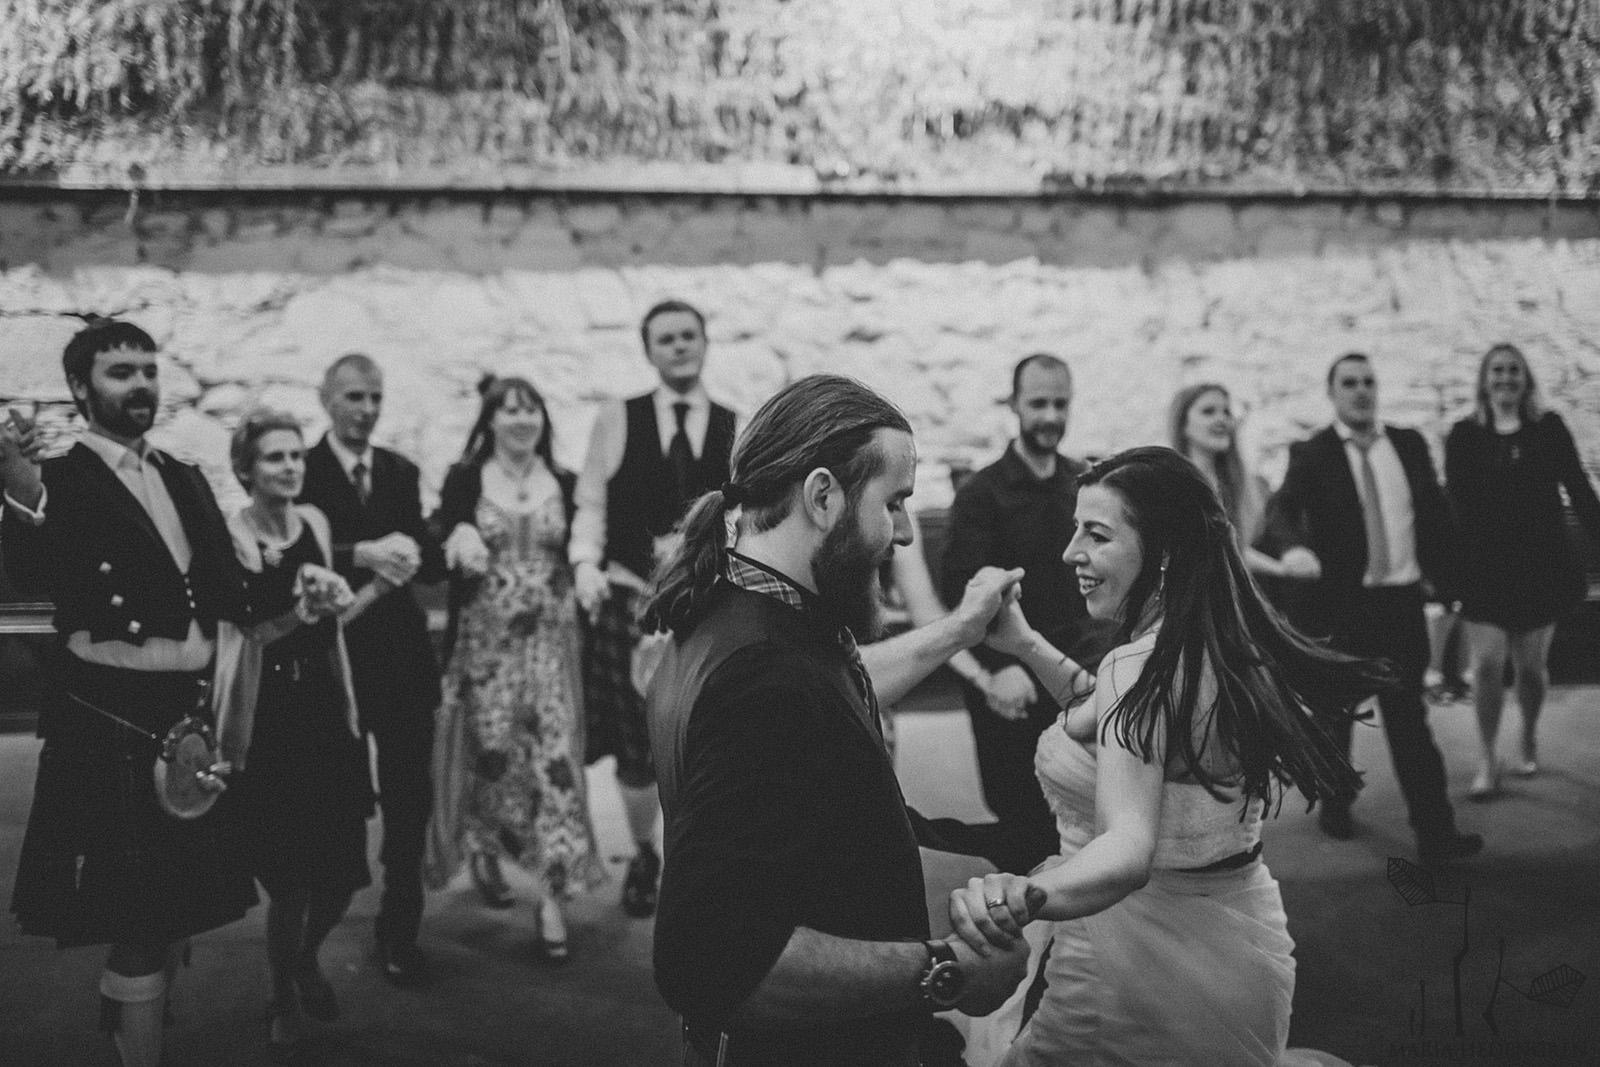 Auld Lang Syne dance